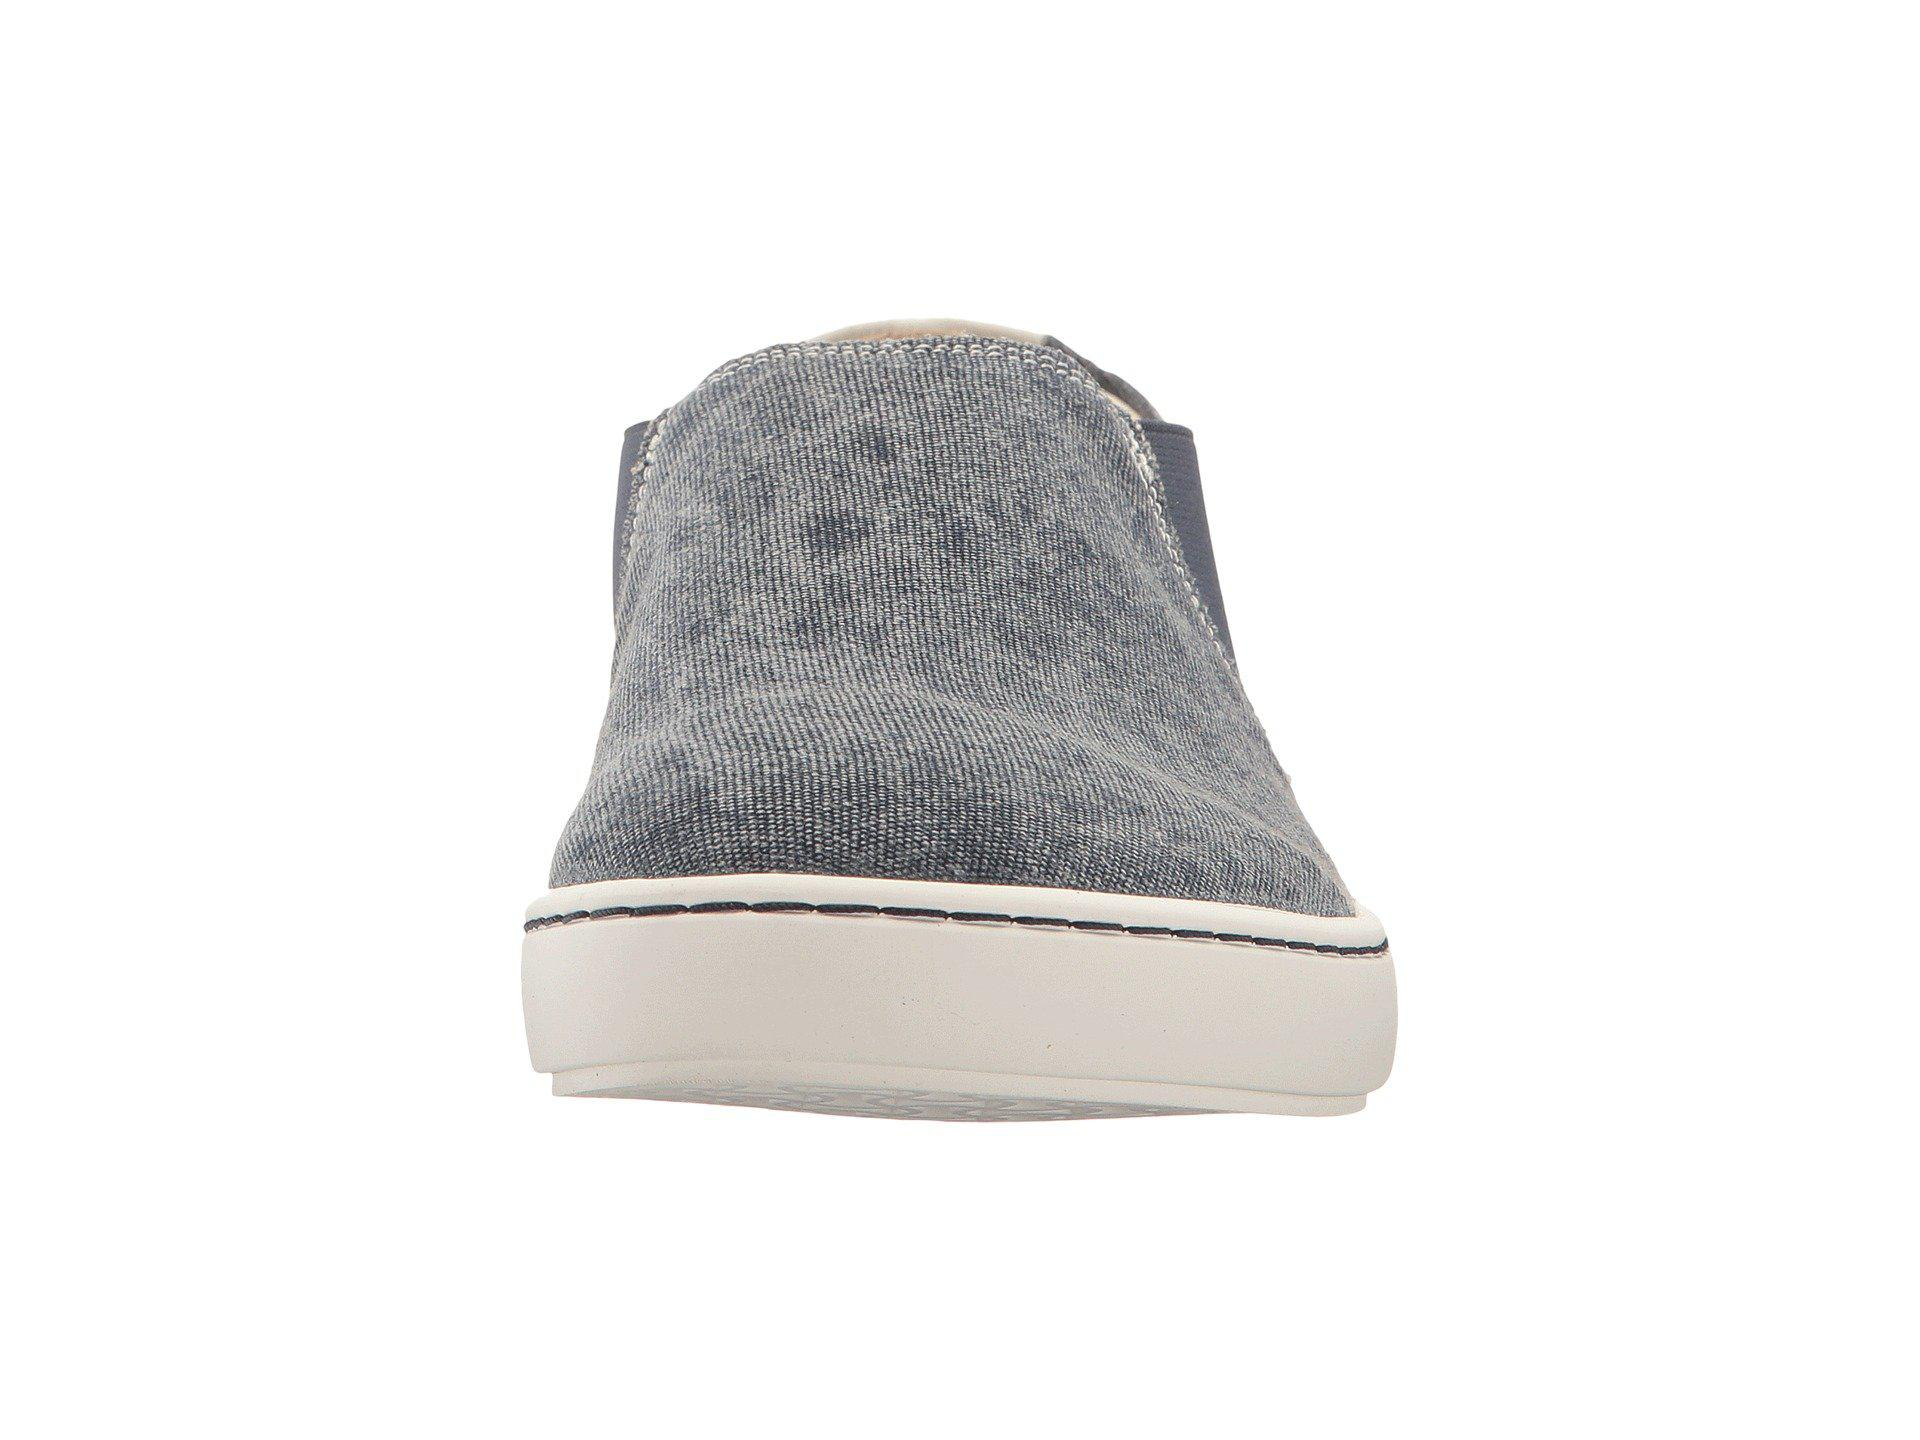 c41fcabb7d77 Birkenstock - Blue Barrie (sand Canvas) Women s Shoes - Lyst. View  fullscreen